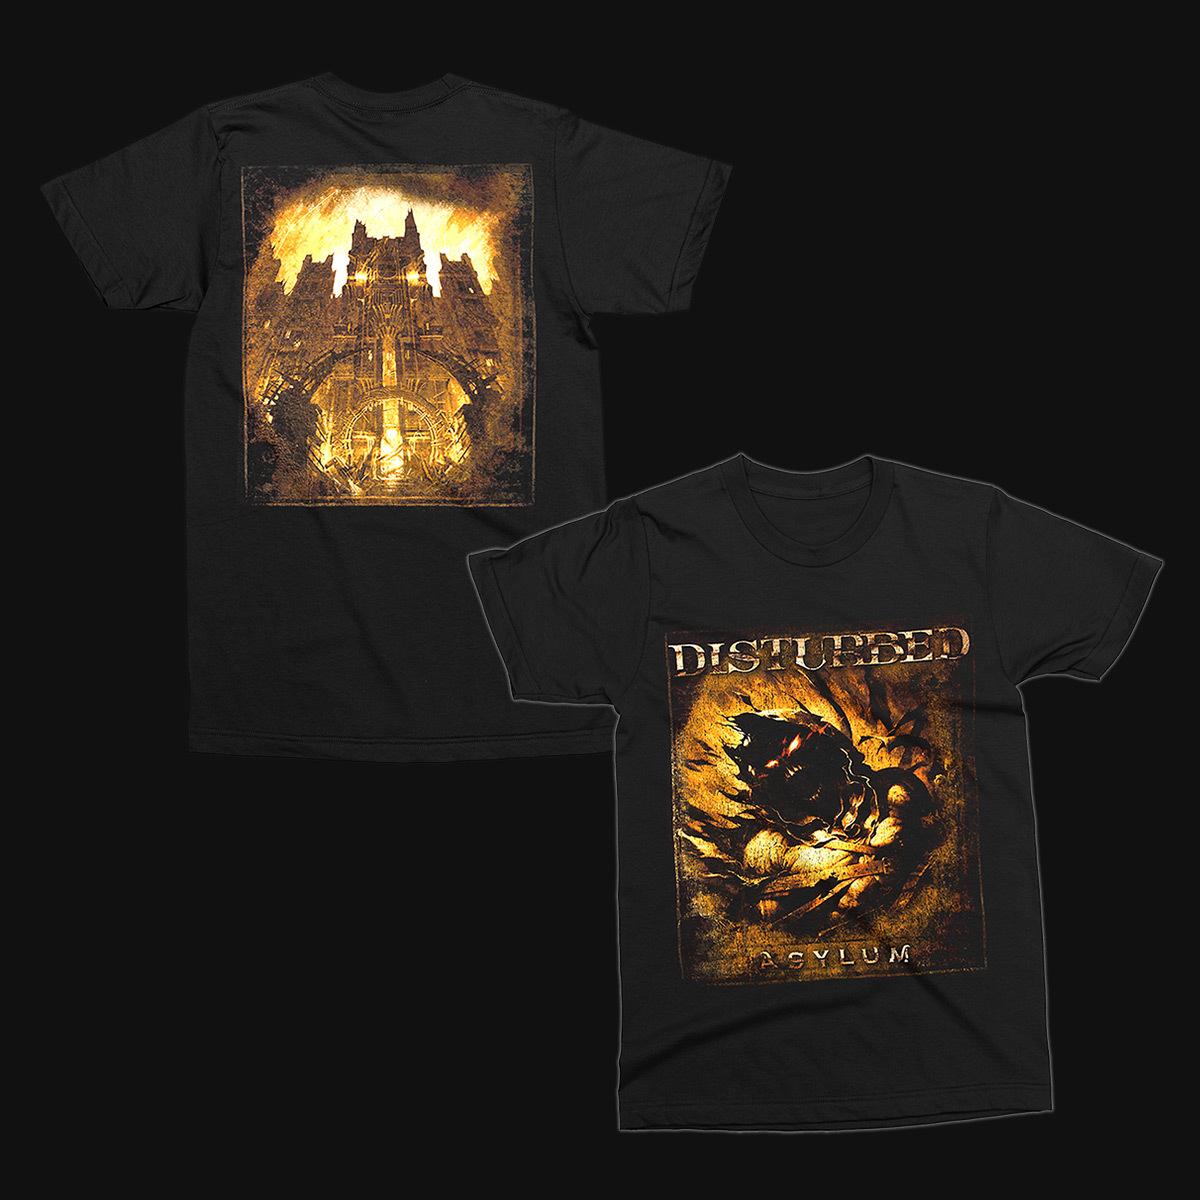 disturbed asylum album cover t shirt shop the musictoday merchandise official store. Black Bedroom Furniture Sets. Home Design Ideas